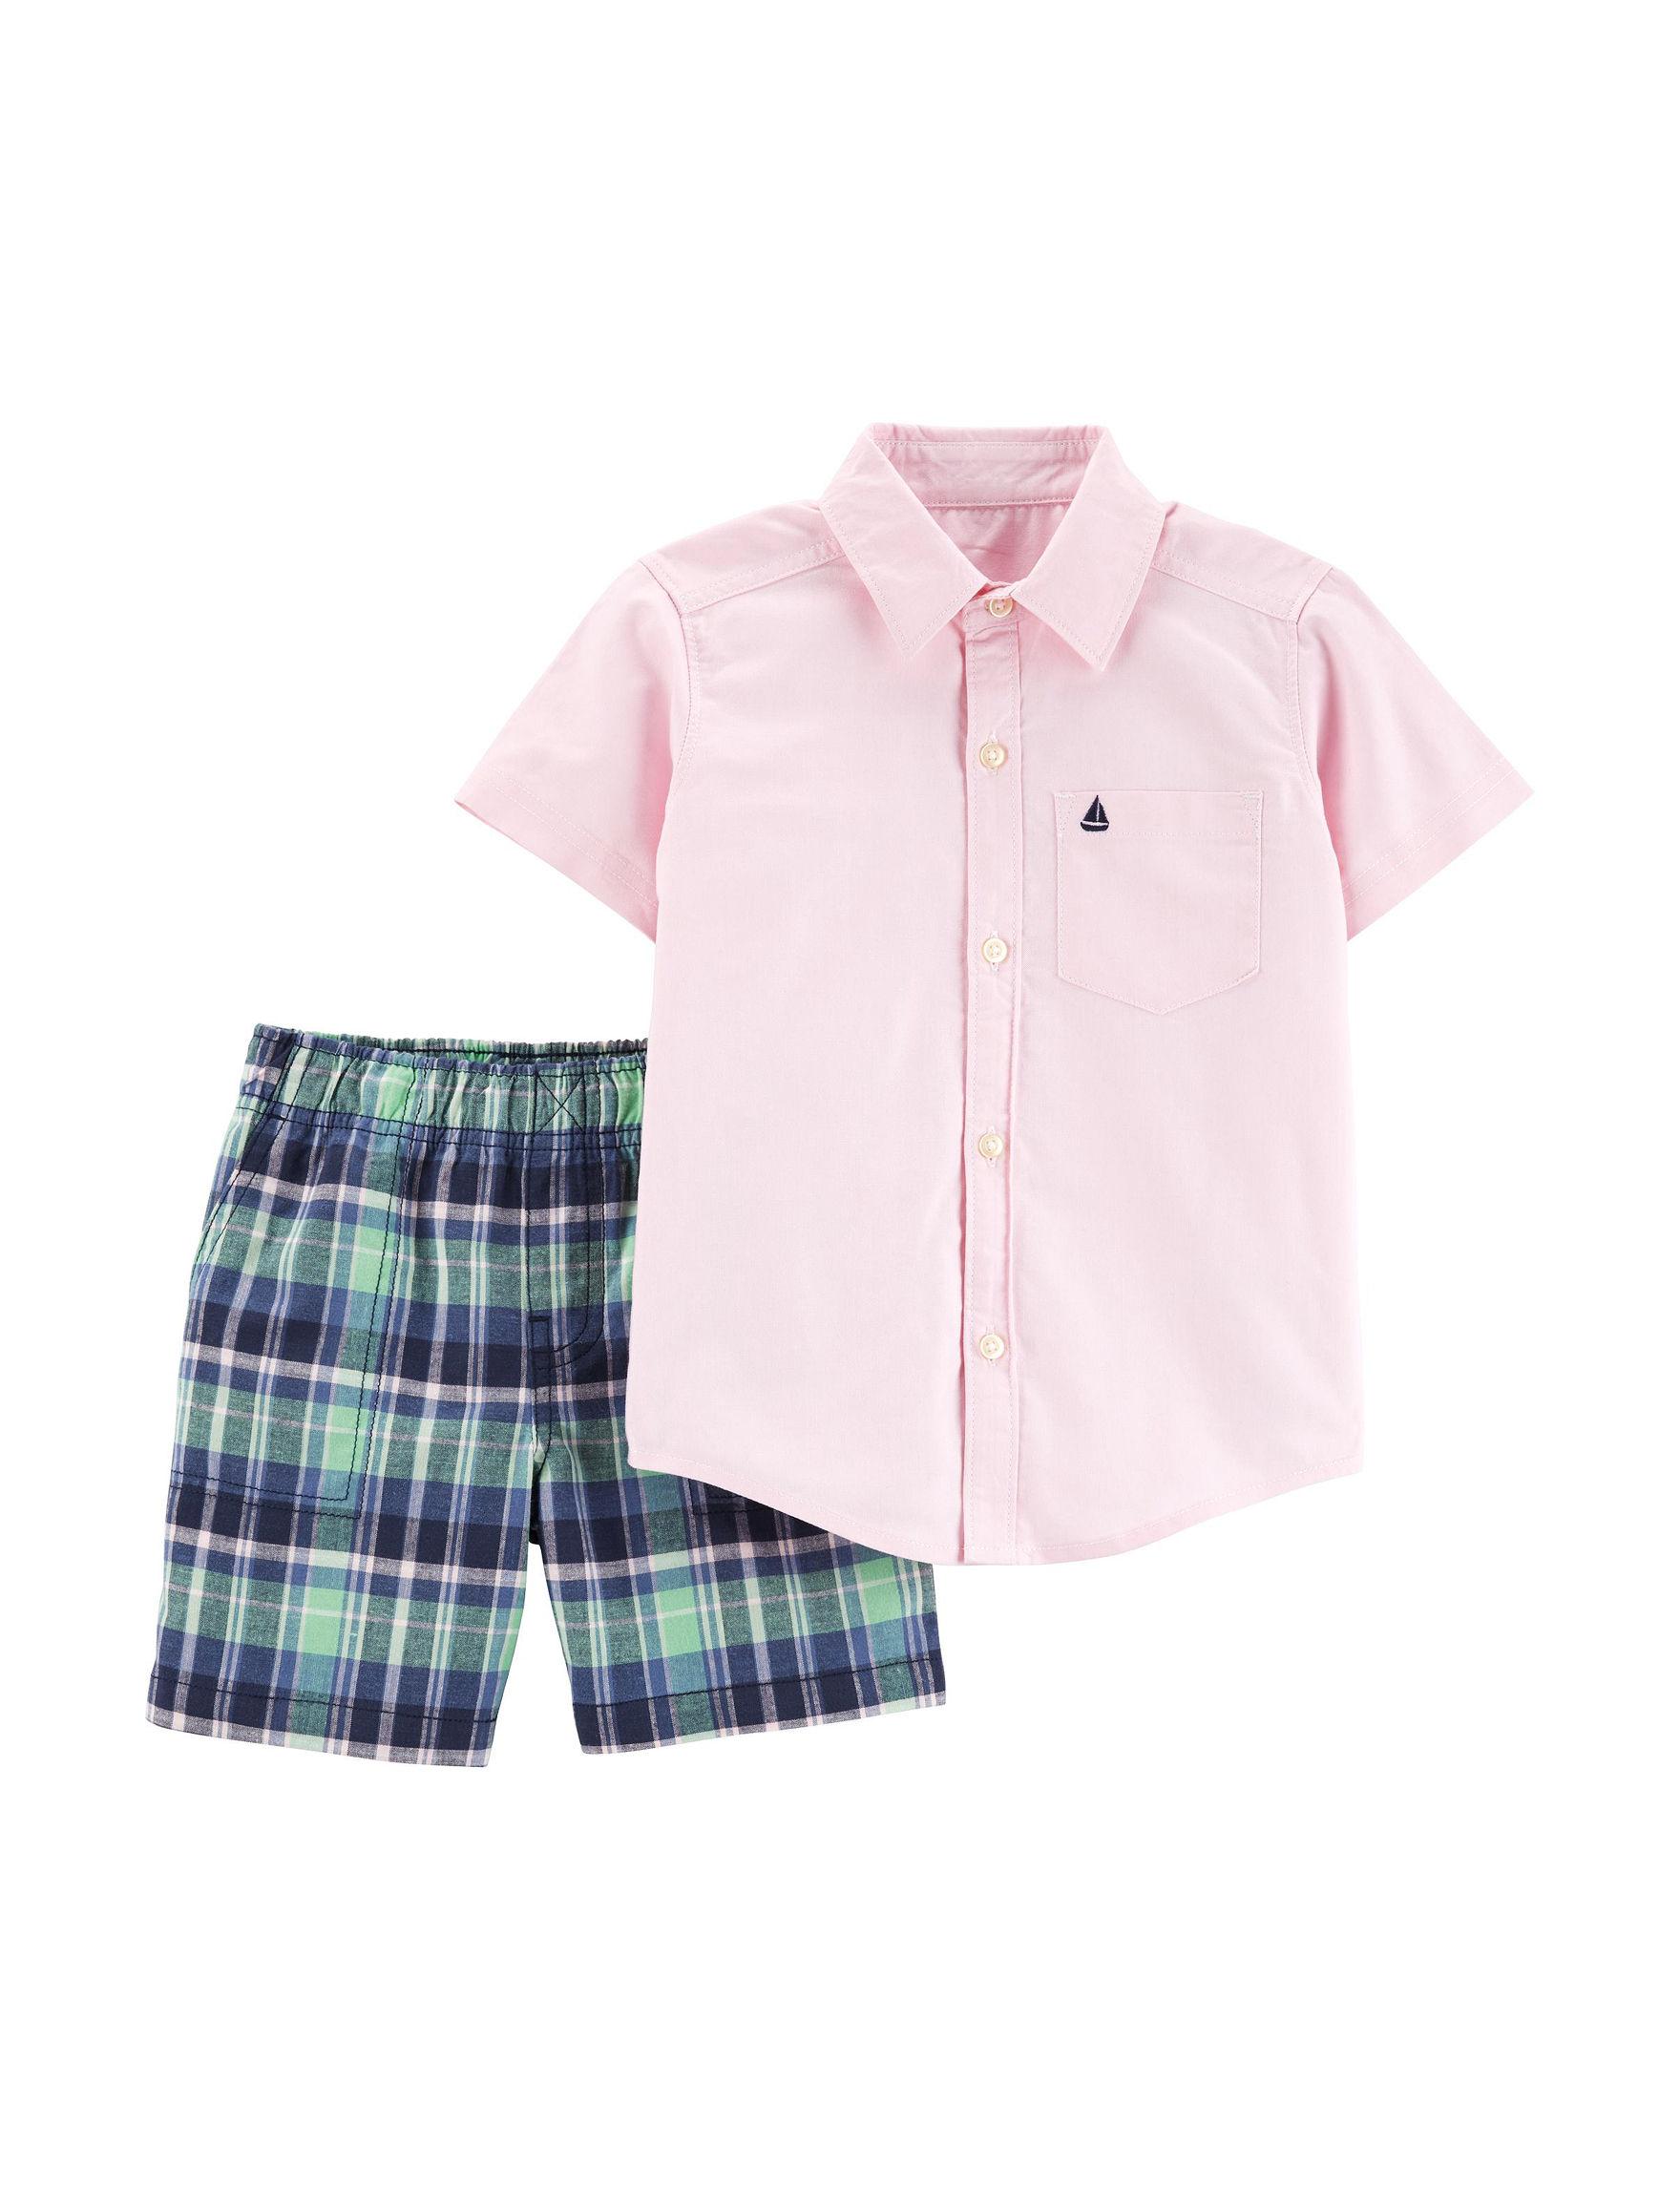 424bcdc98 Carter s 2-pc. Woven Shirt   Shorts Set - Toddler Boys